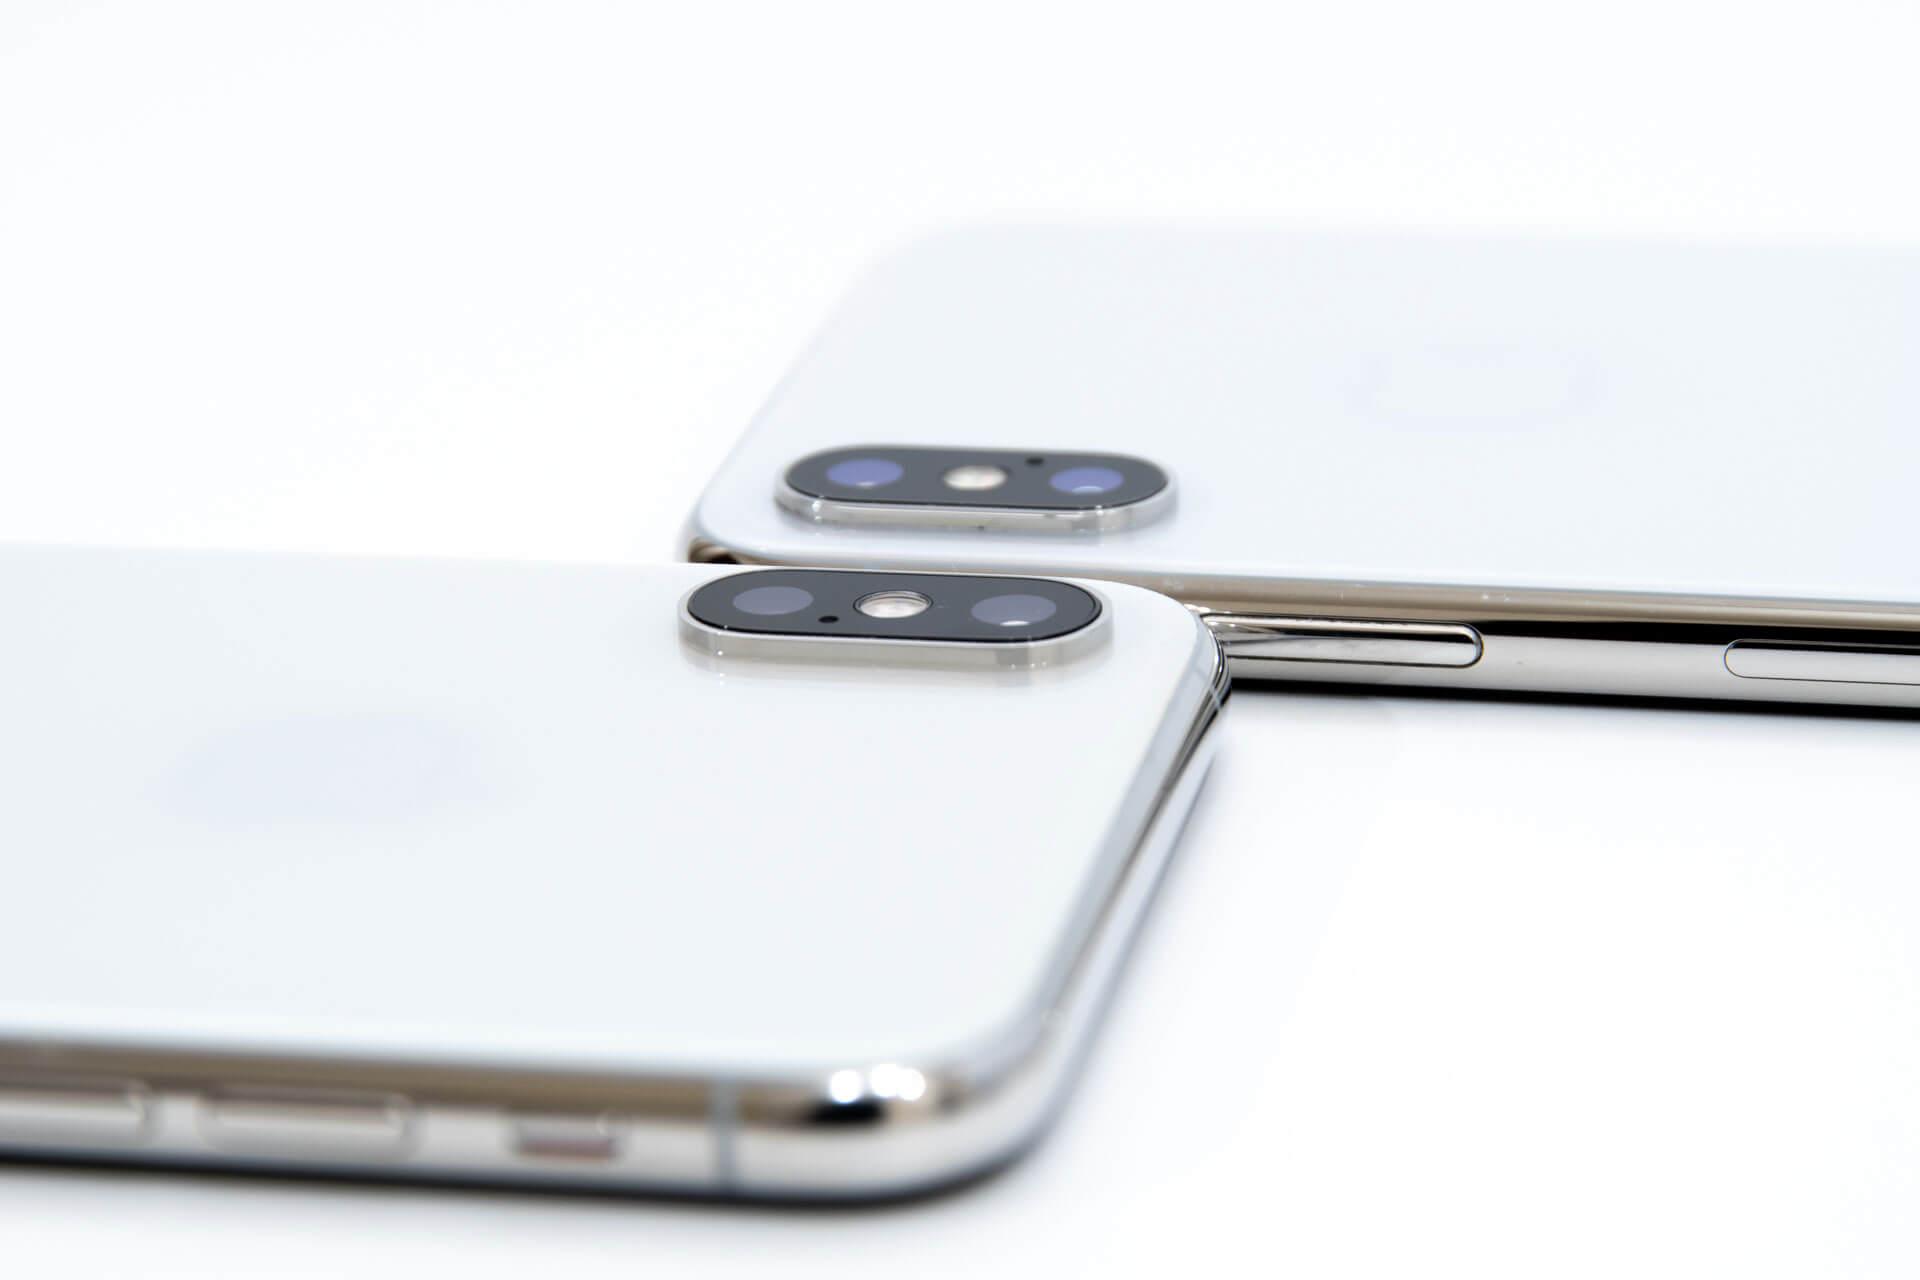 iPhone XS iPhone 外観比較 カメラ部分